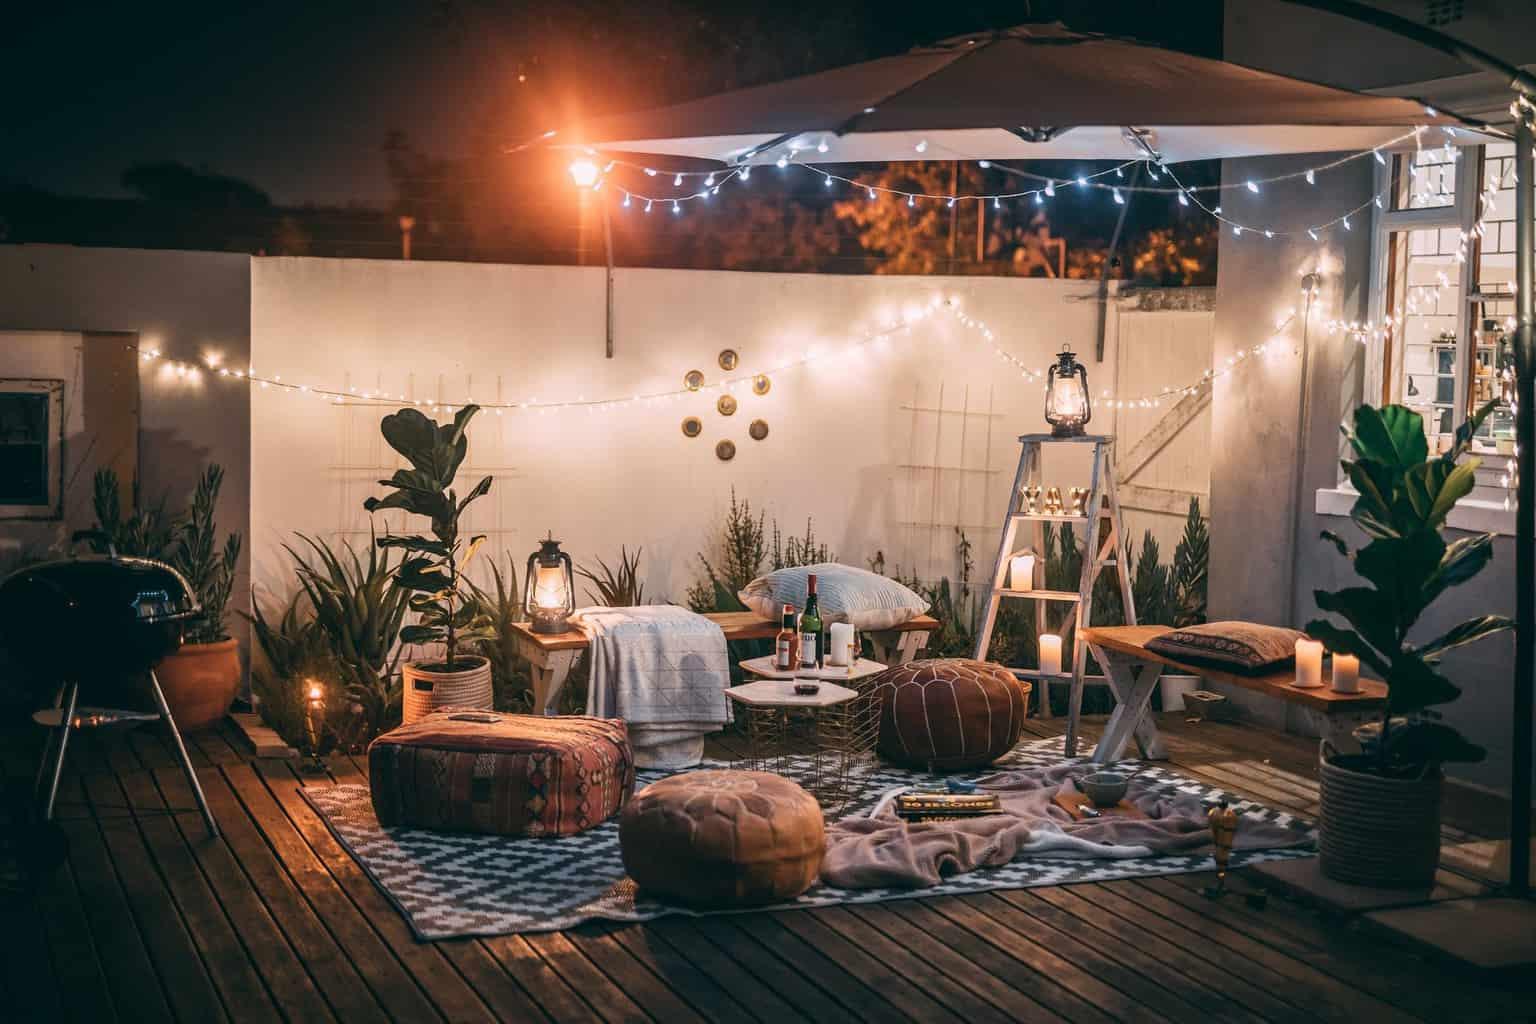 Romantic date night